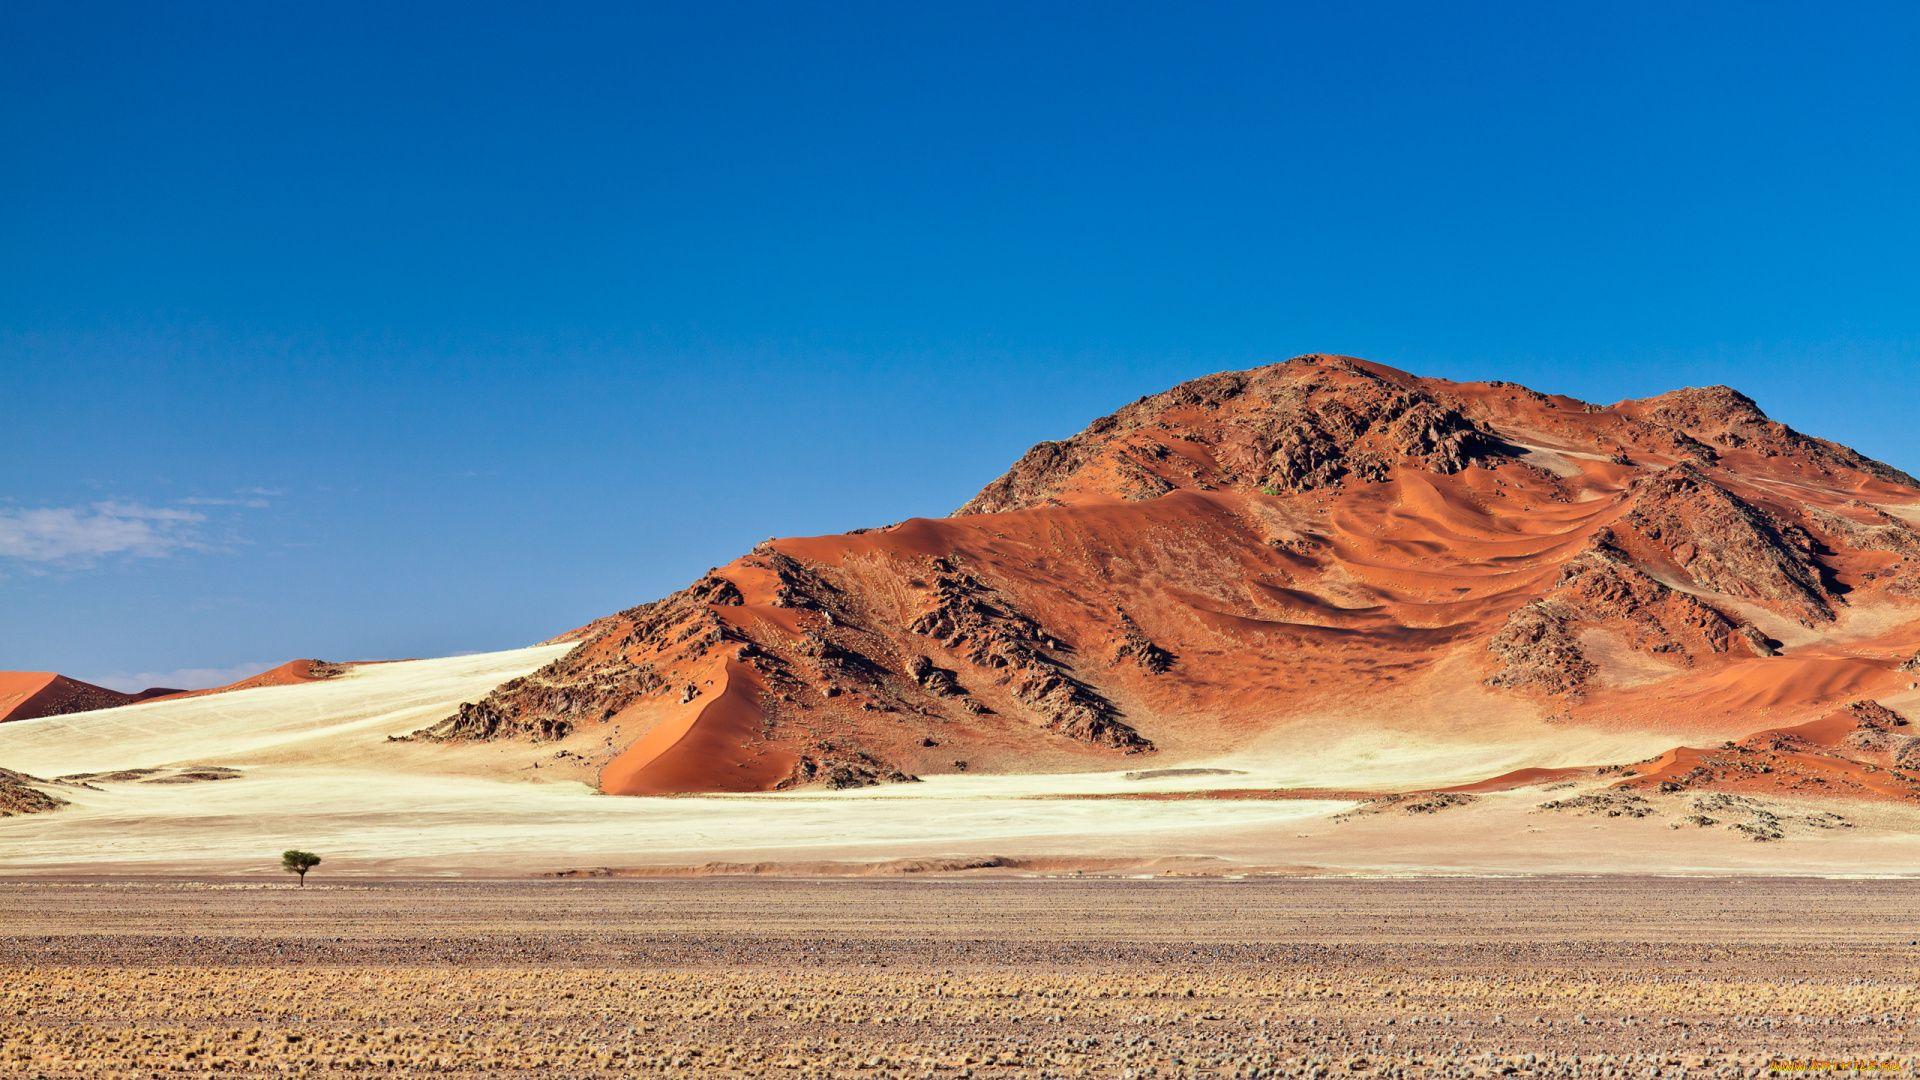 Desert Foothills Landscape laptop background wallpaper